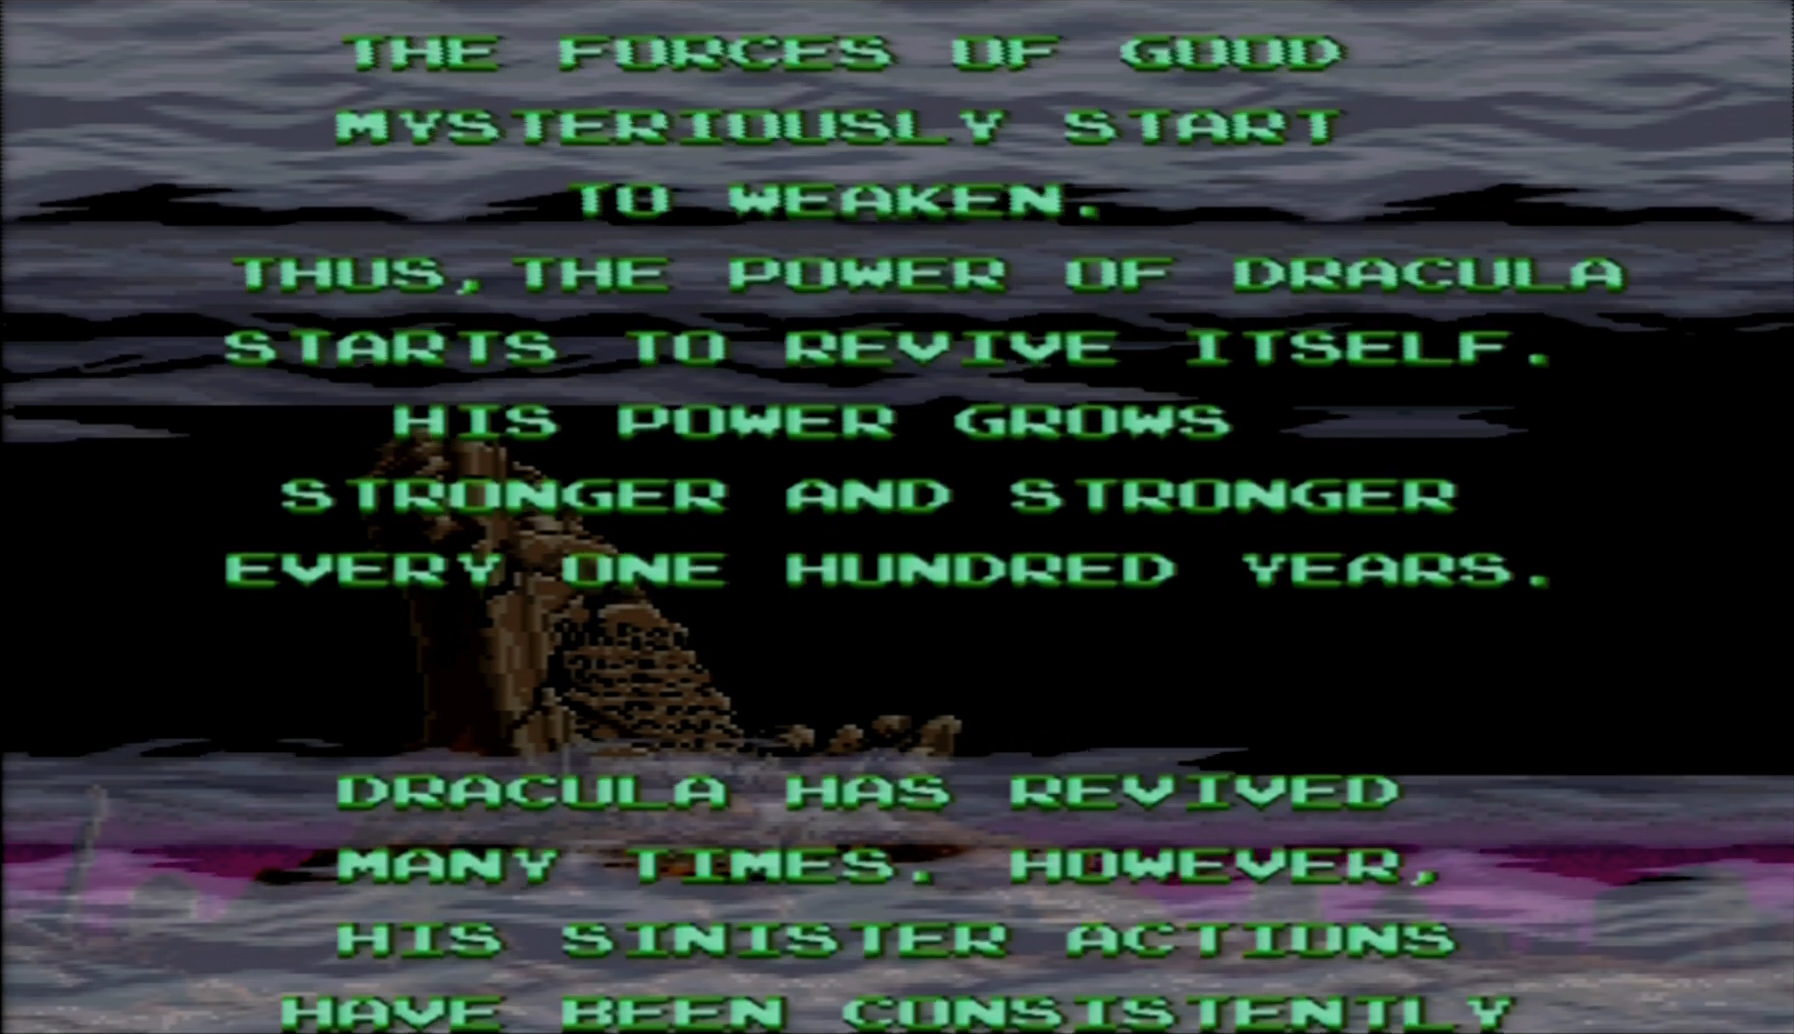 Copy of Castlevania IV: HD Link for SNES